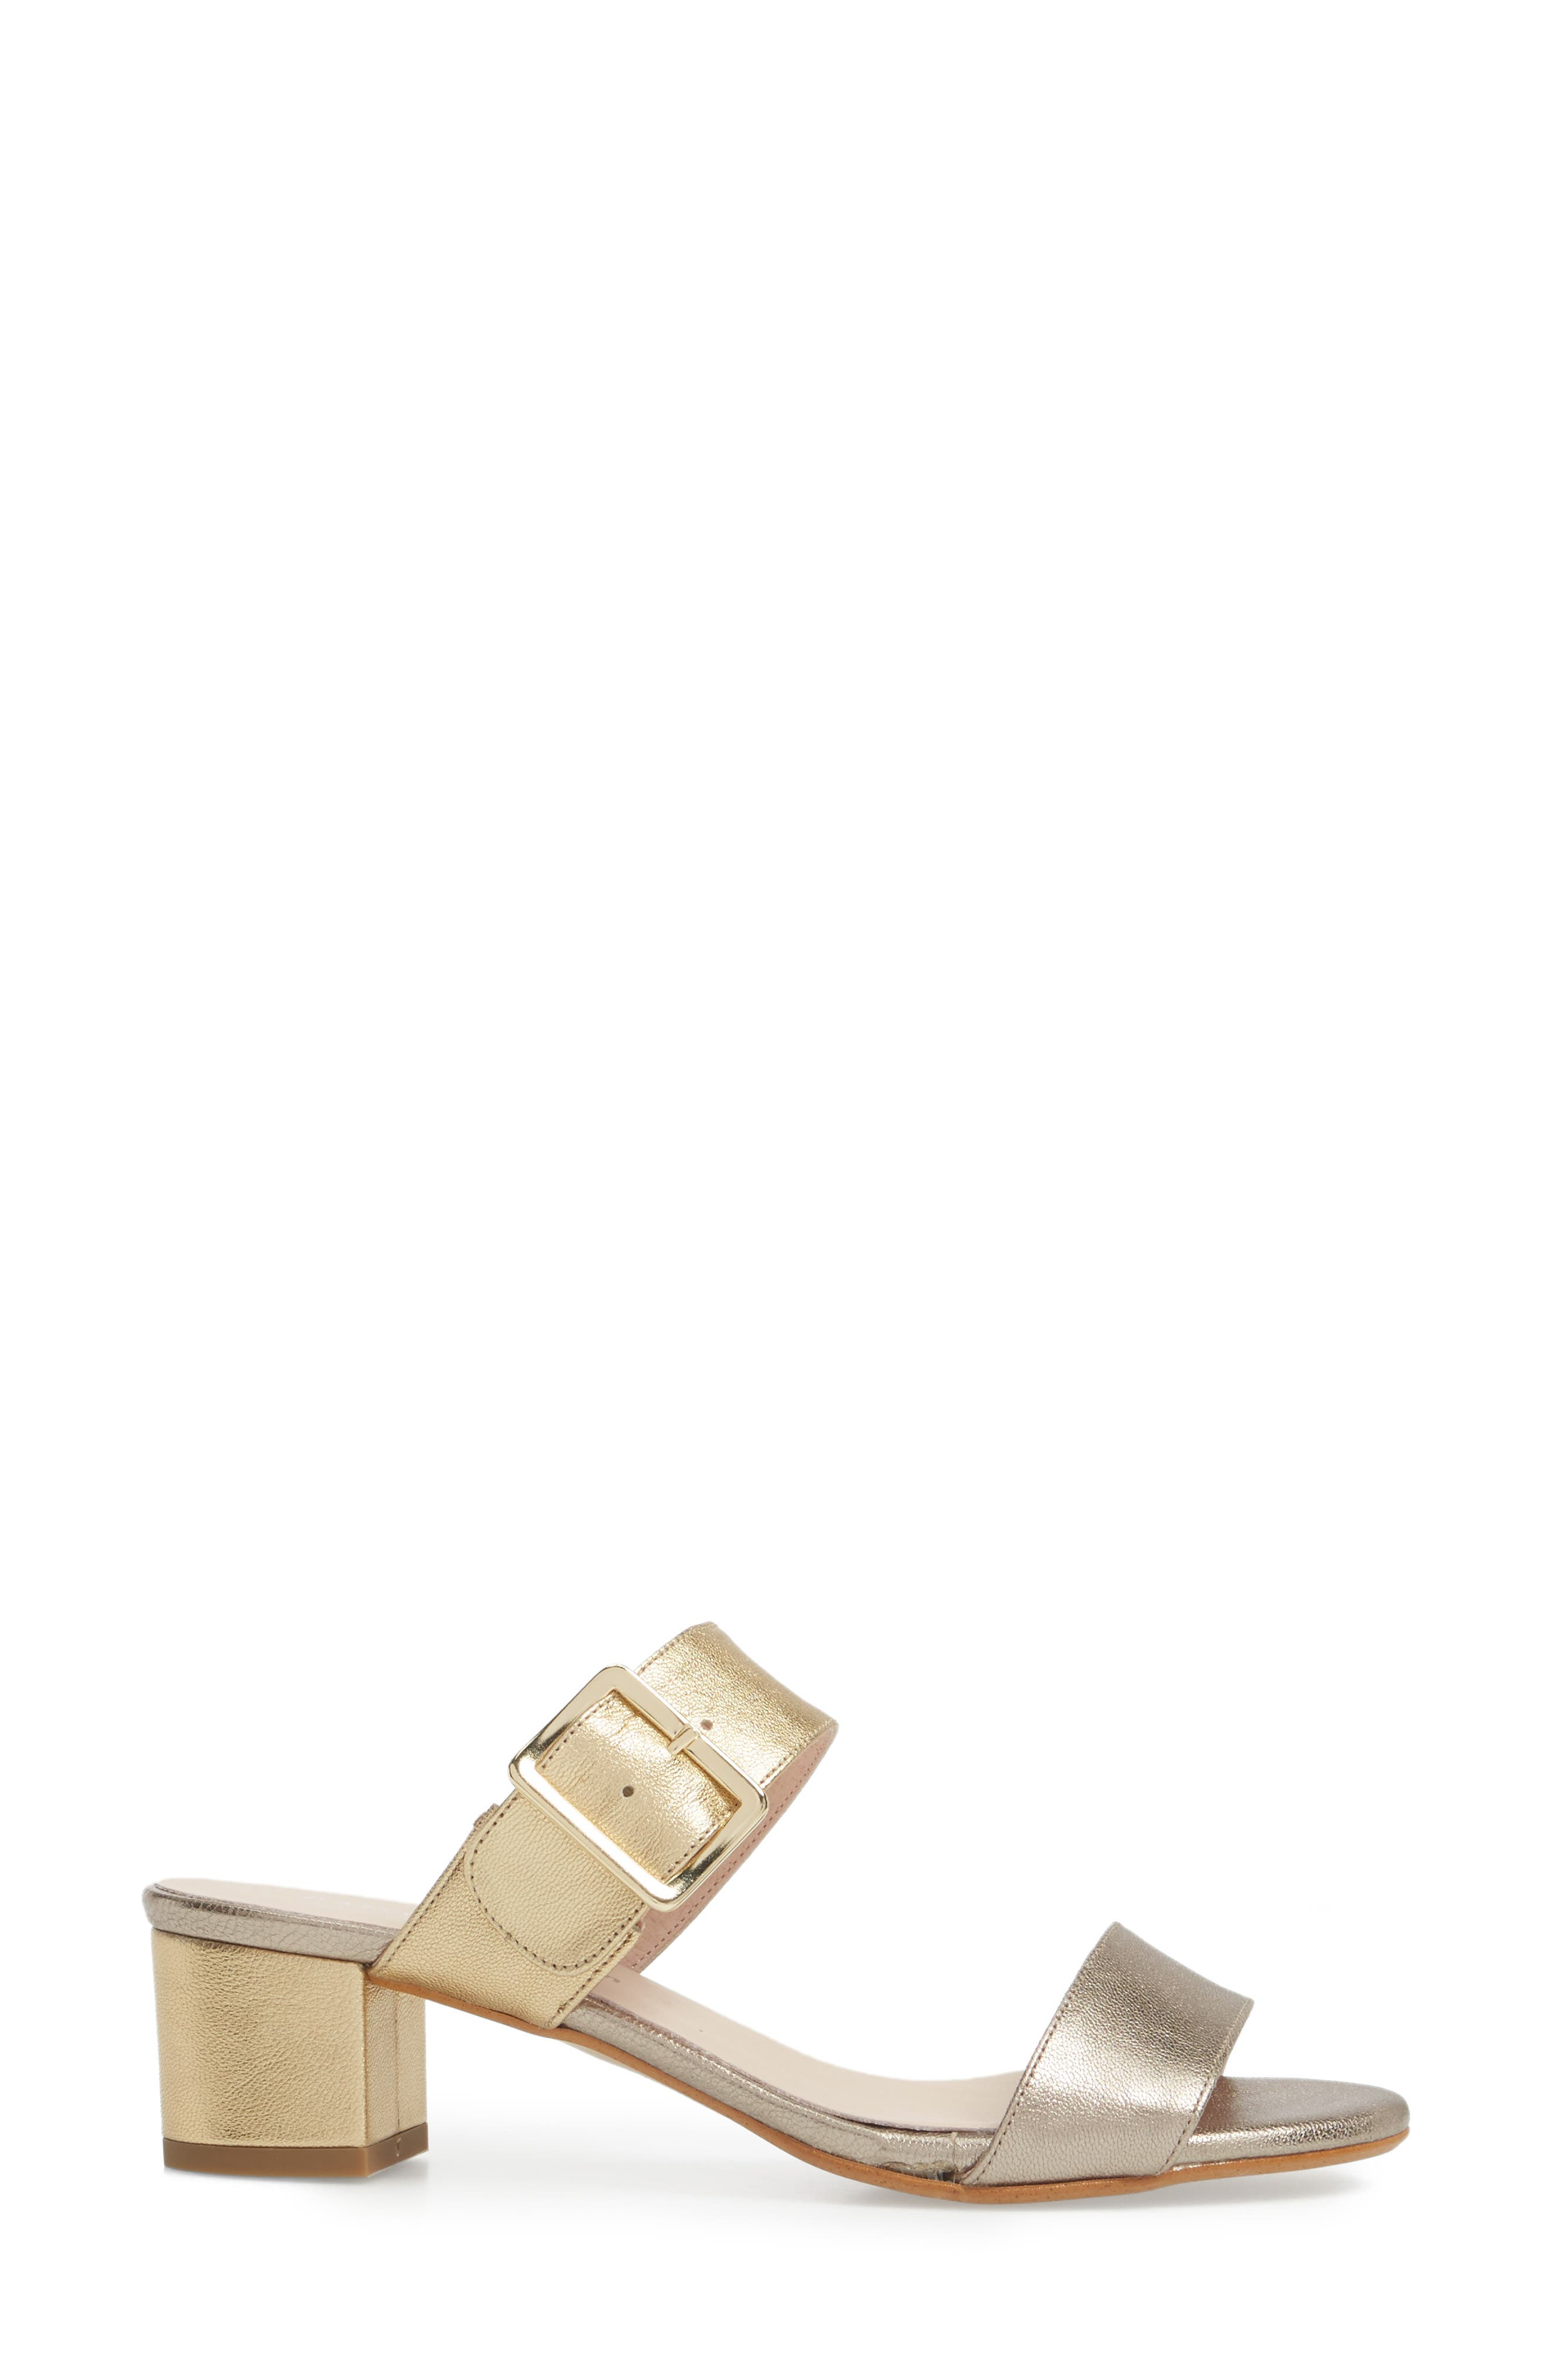 Ruth Slide Sandal,                             Alternate thumbnail 3, color,                             Gold/ Bronze Leather